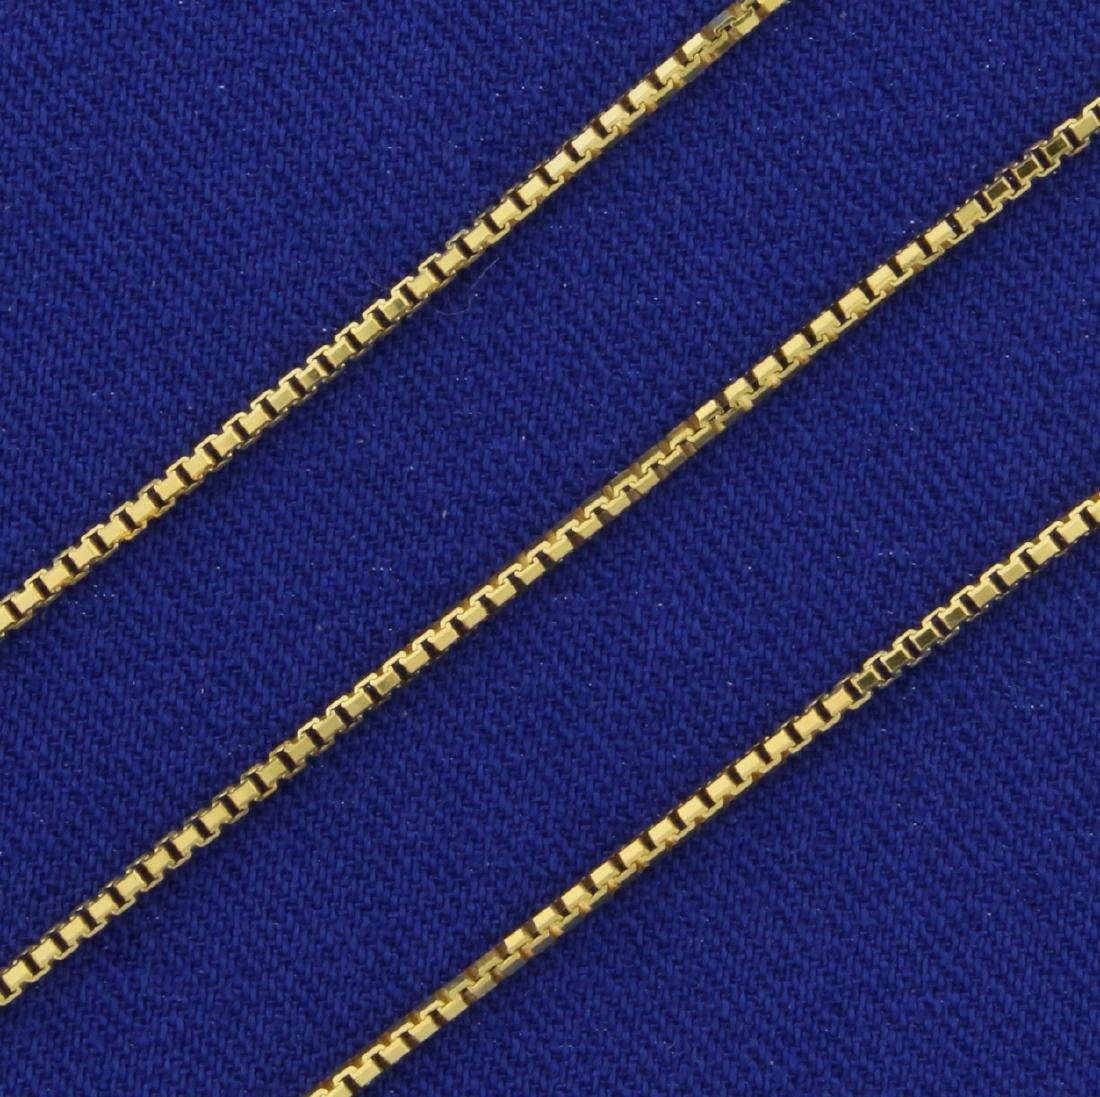 18 1/2 Inch Italian Made Box Neck Chain in 14K Yellow - 2